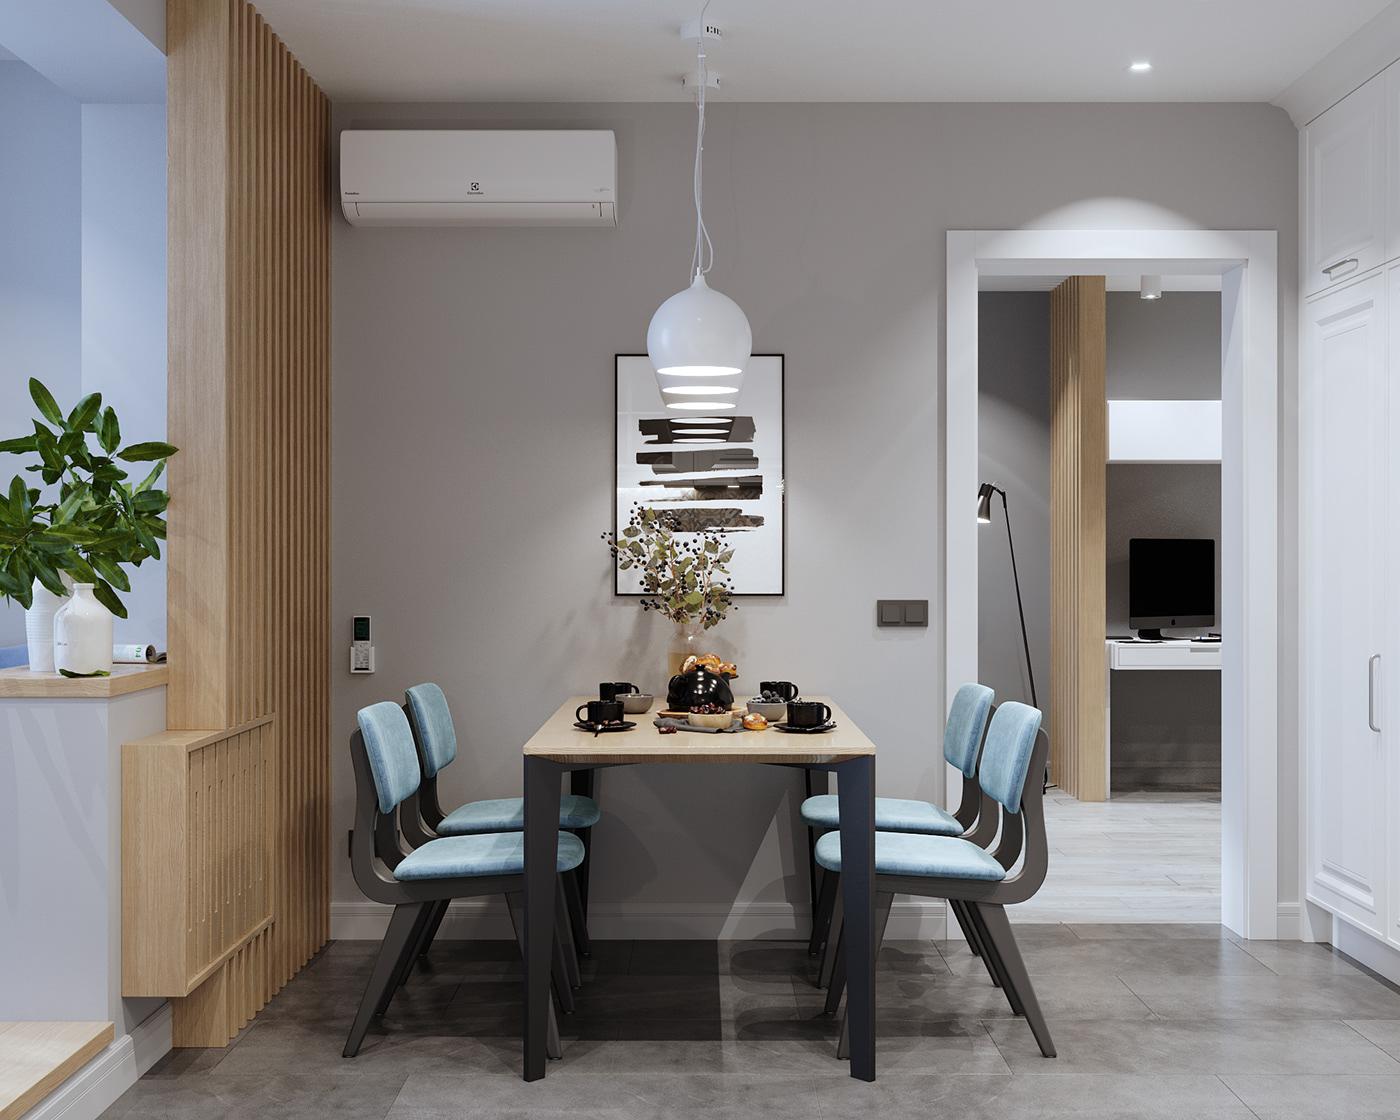 Interior Visualization,corona render ,3D Visualization,kitchen,living room,bedroom,bathroom